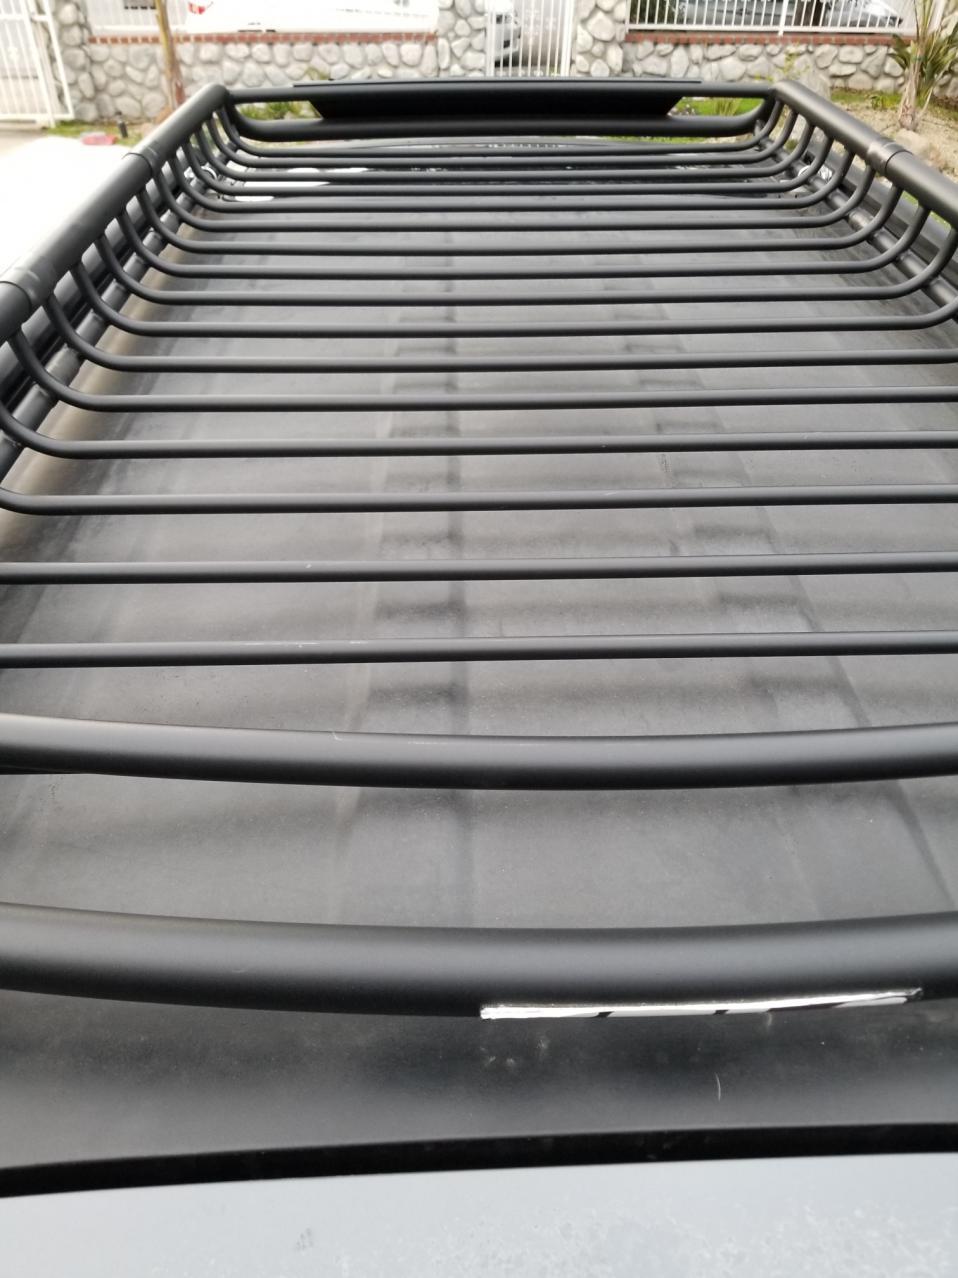 4th gen Sport Step, rails, rola rack basket-20200120_164540_resized-jpg